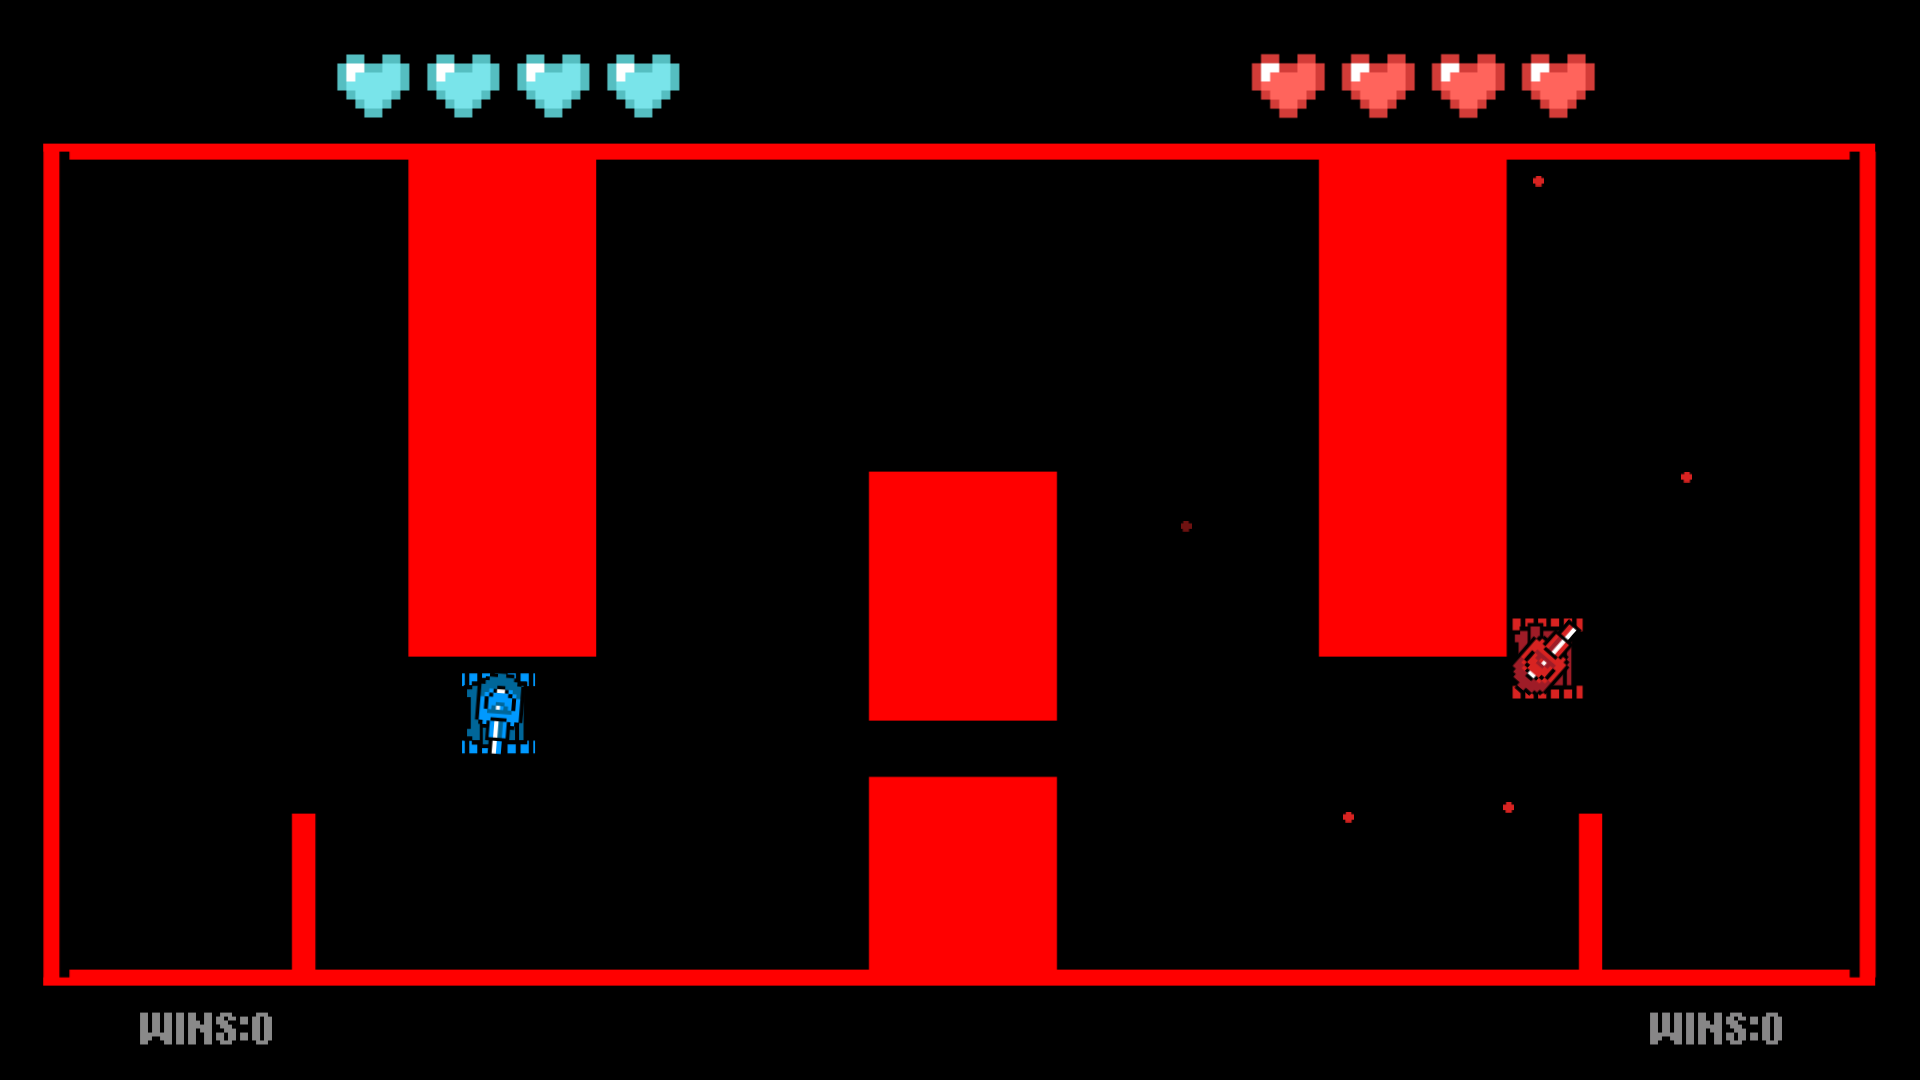 Tank Battle - 2 Player Classic Arcade Game screenshot 5